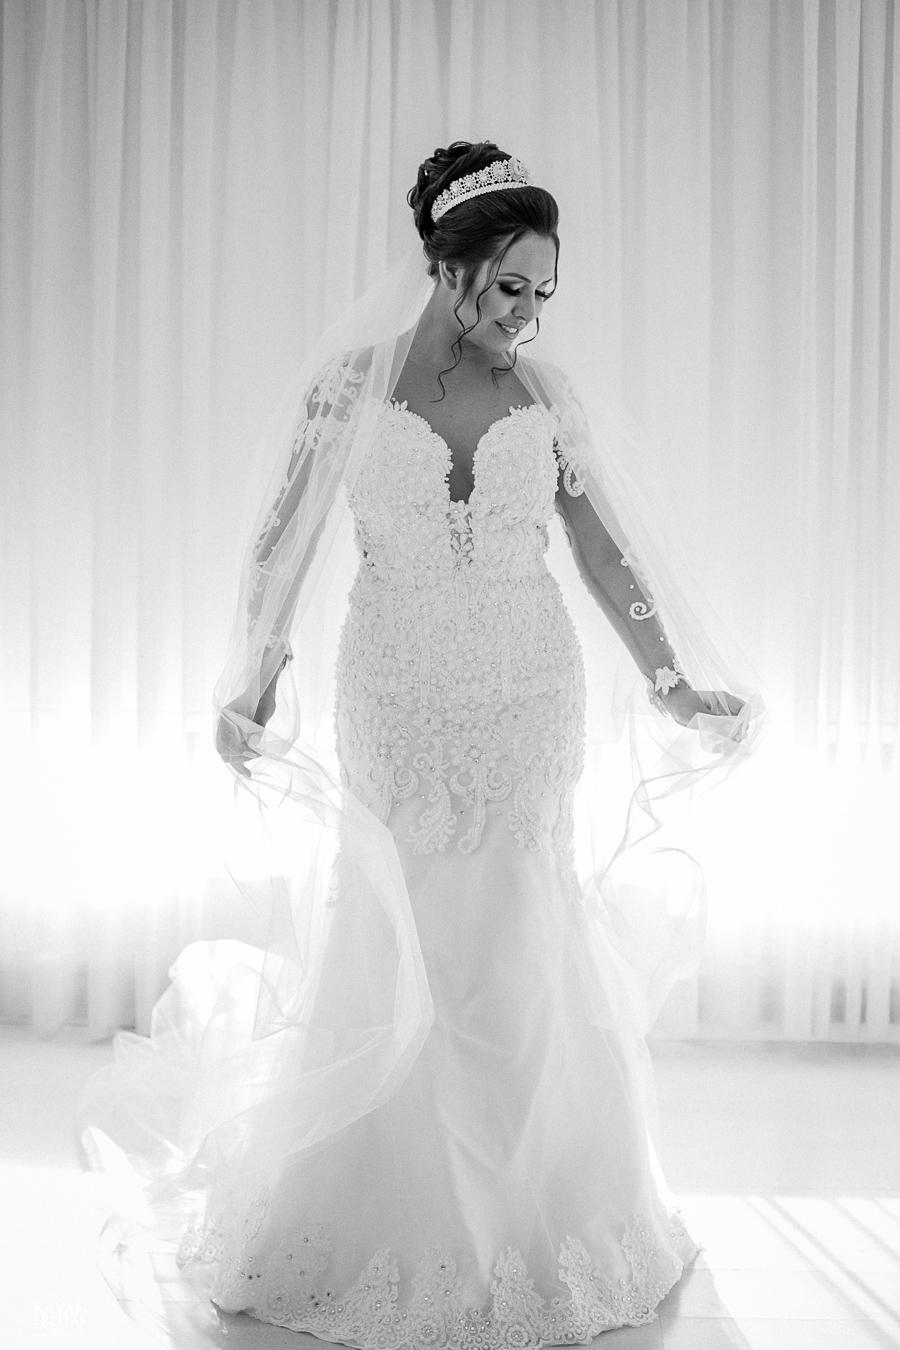 casamento-paularamos-florianopolis-0036 Casamento Cris e Mickael - Paula Ramos Florianópolis